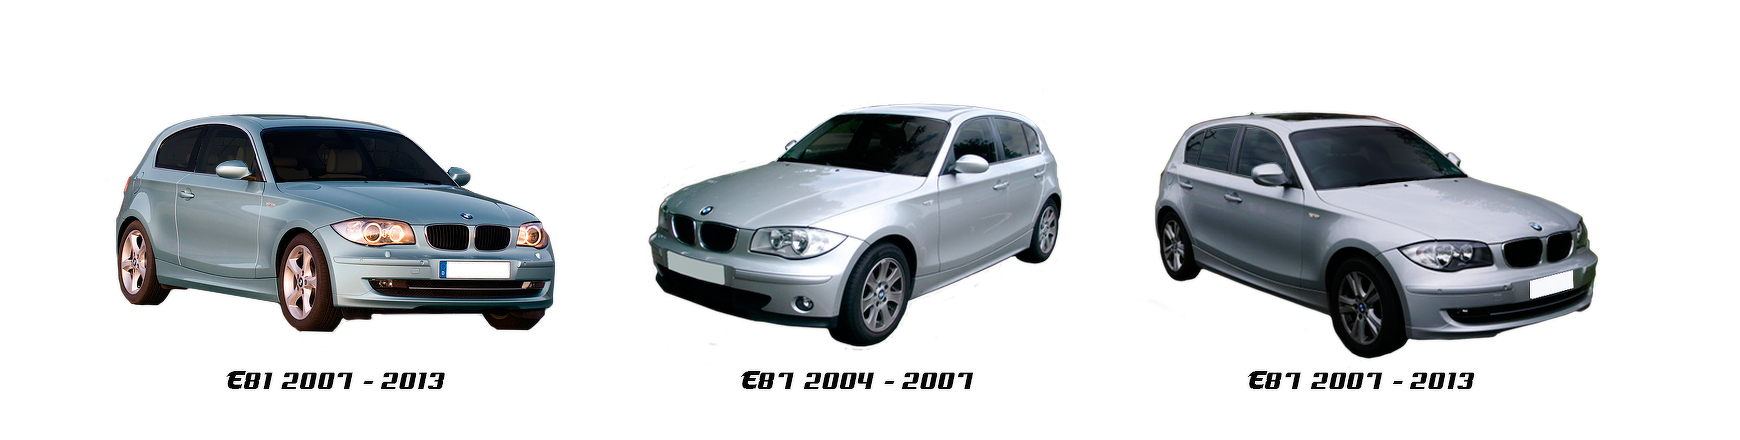 Recambios de coche para BMW Serie 1 E87 de 2007 a 2013 al mejor precio